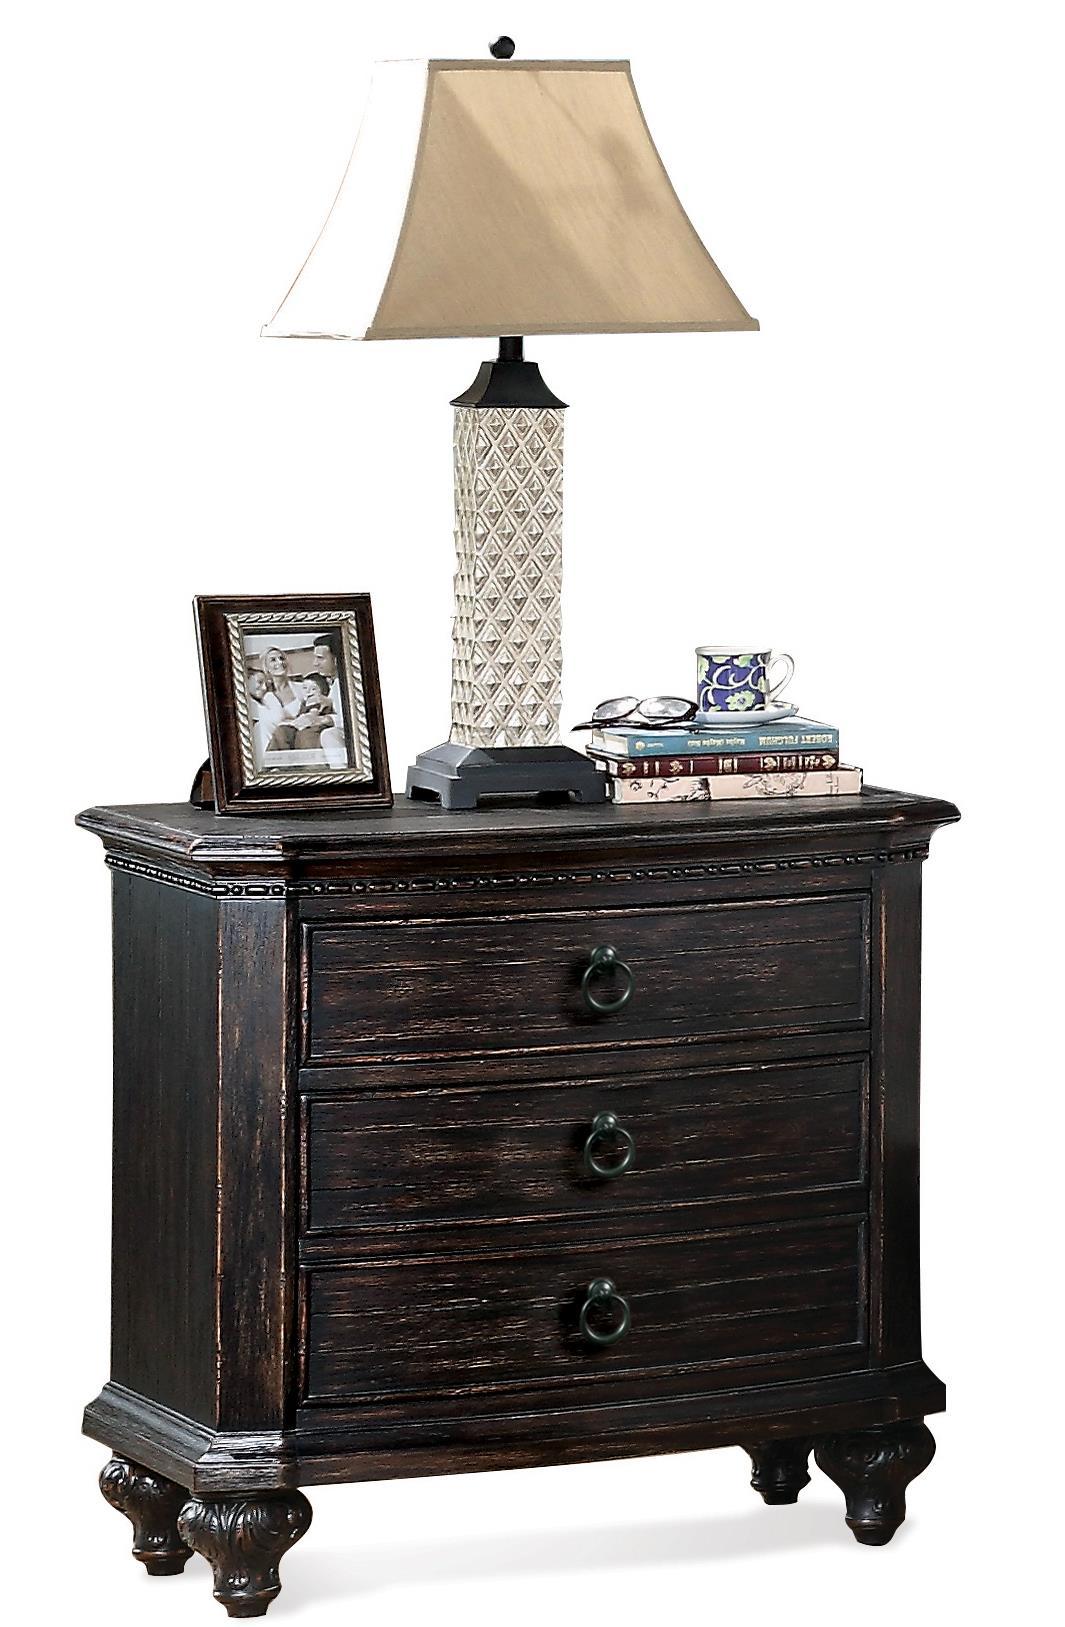 Riverside Furniture Bellagio Two Drawer Nightstand - Item Number: 11869